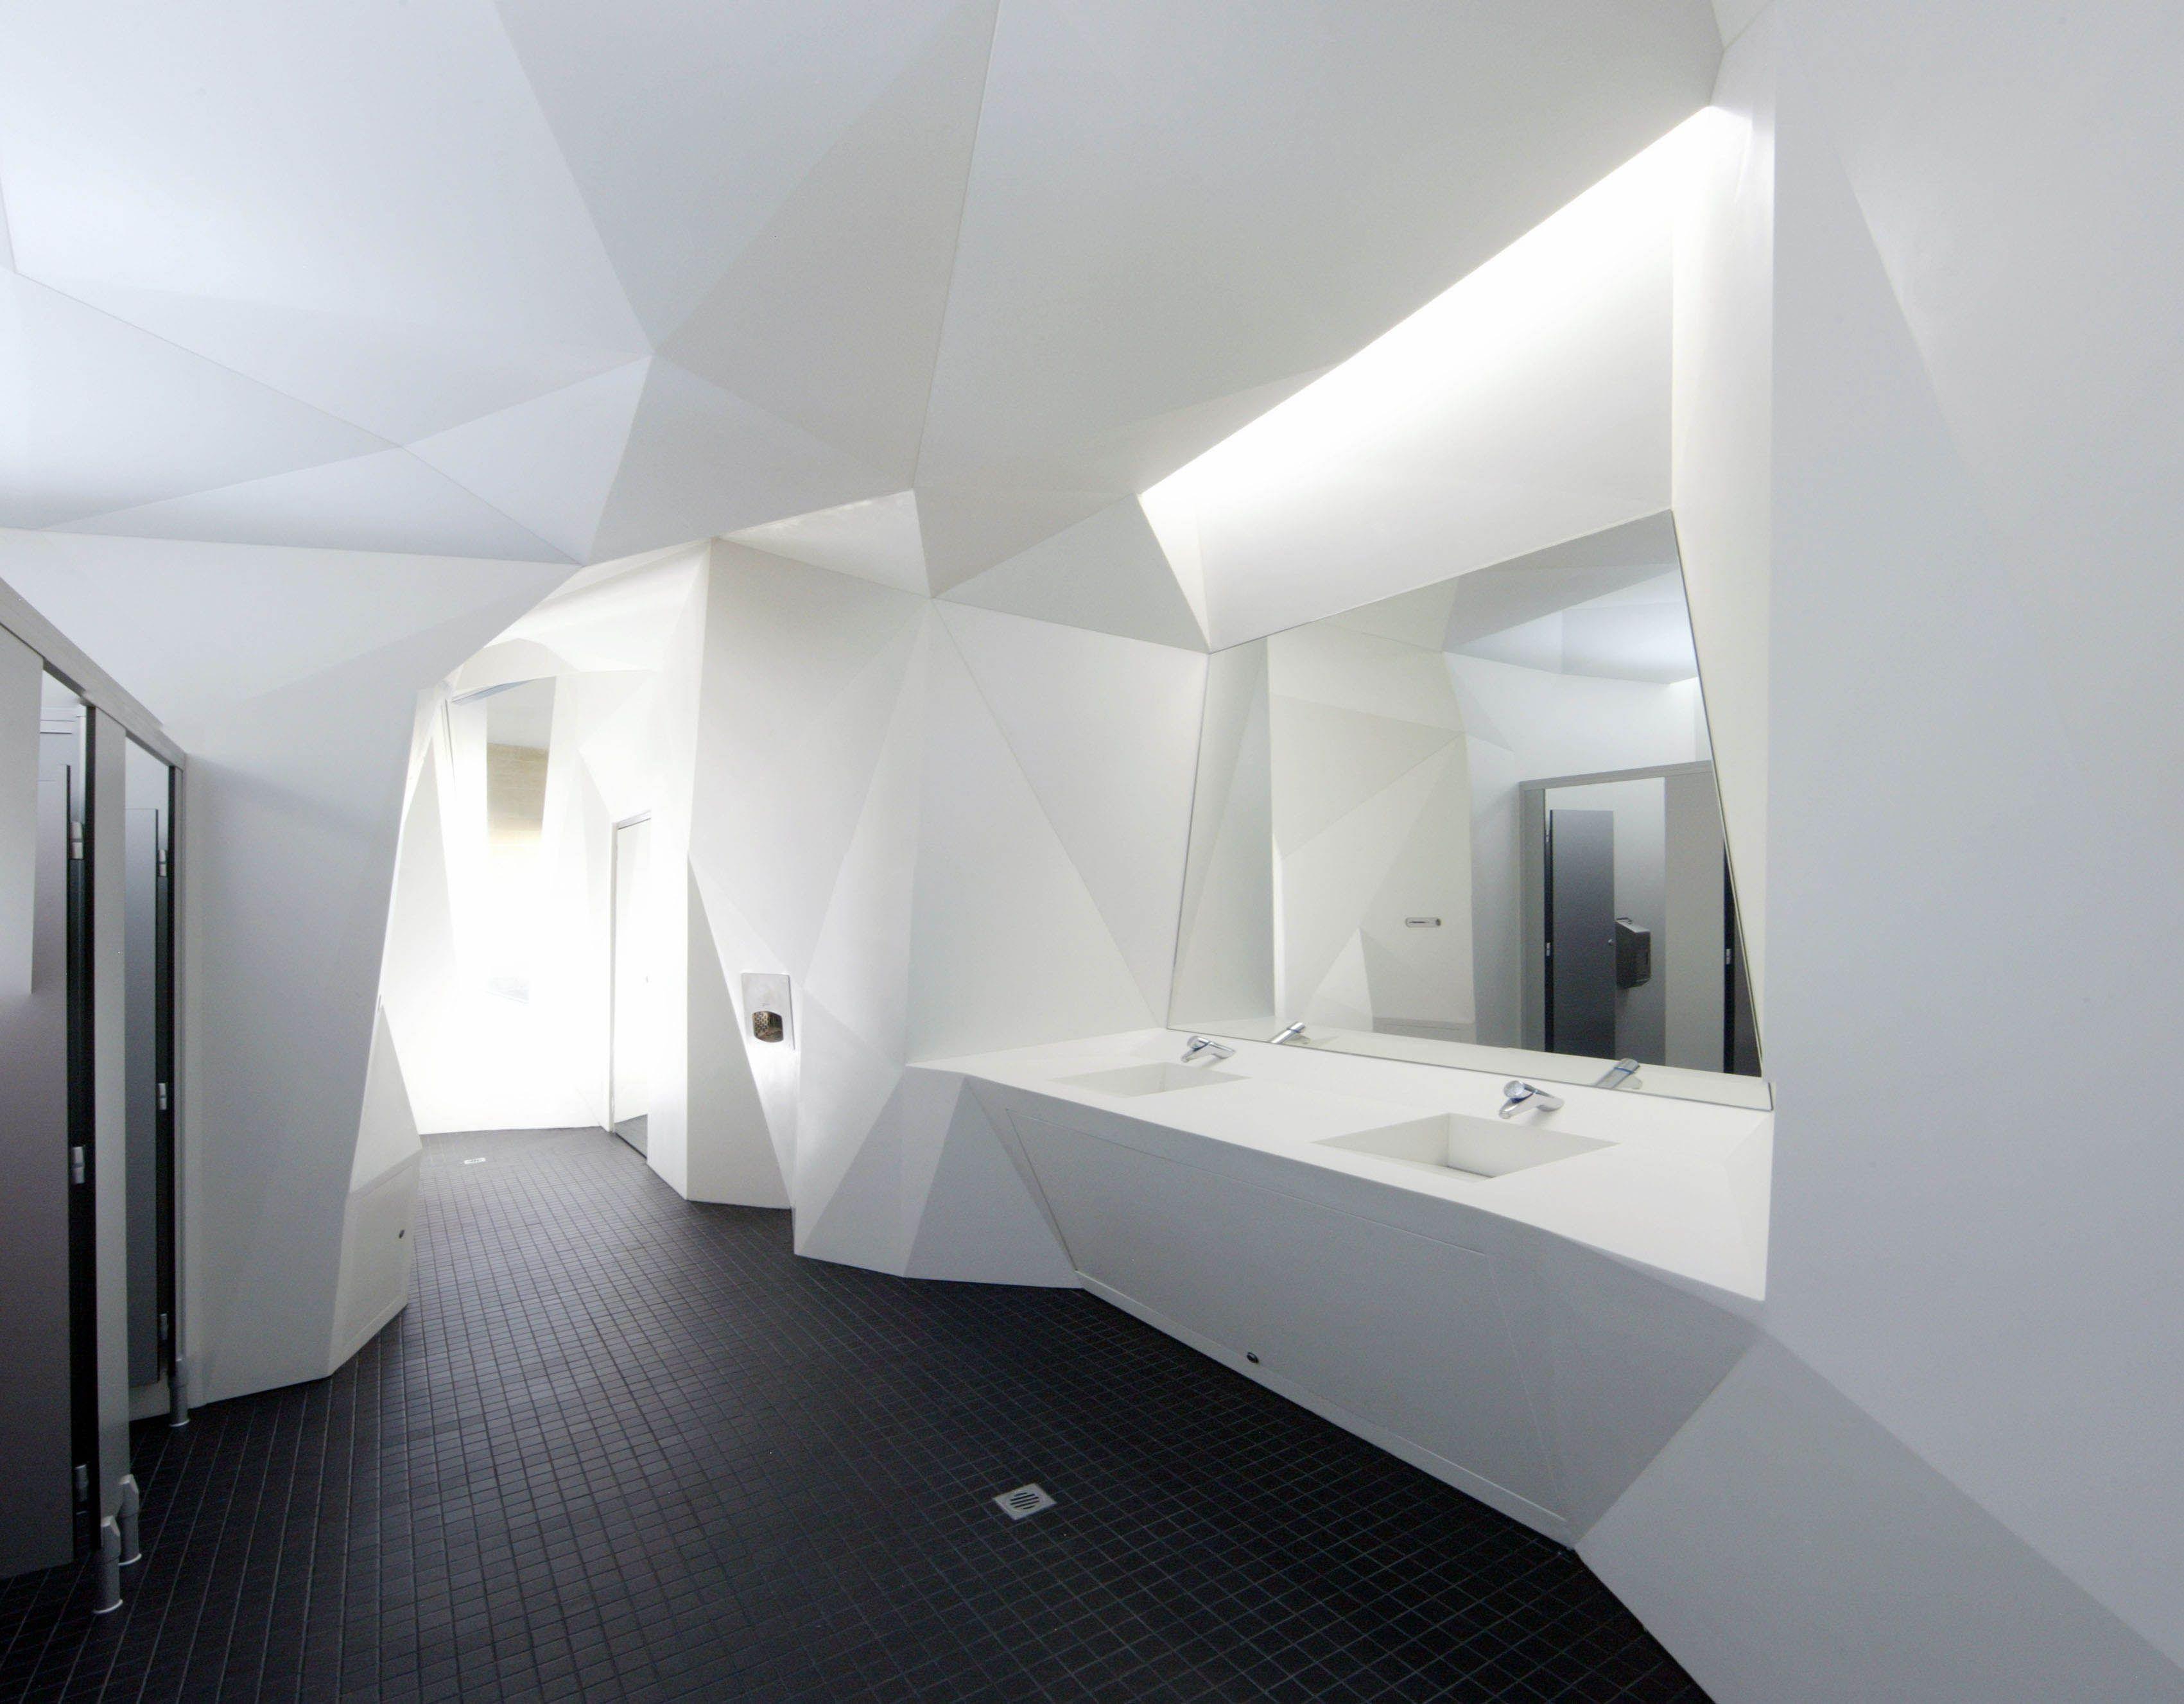 Toilet Desing 513 best toilet / bathroom images on pinterest   toilet design